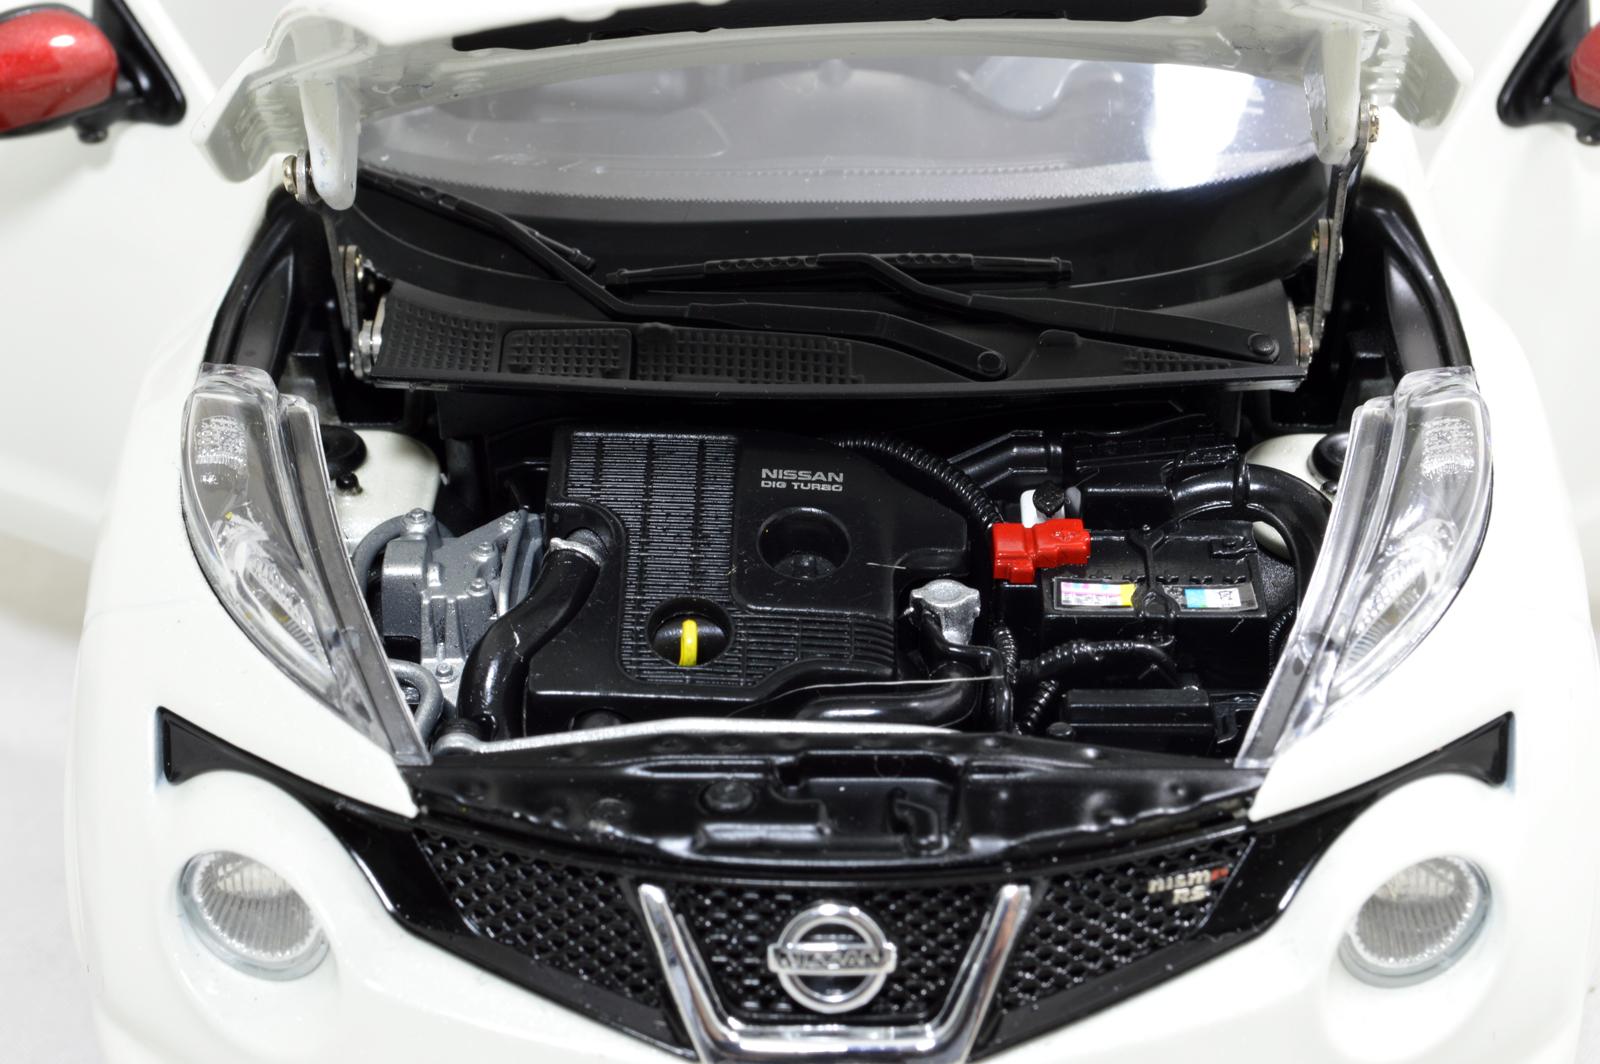 Nissan Juke Nismo RS 2014 1/18 Scale Diecast Model Car Wholesale 6